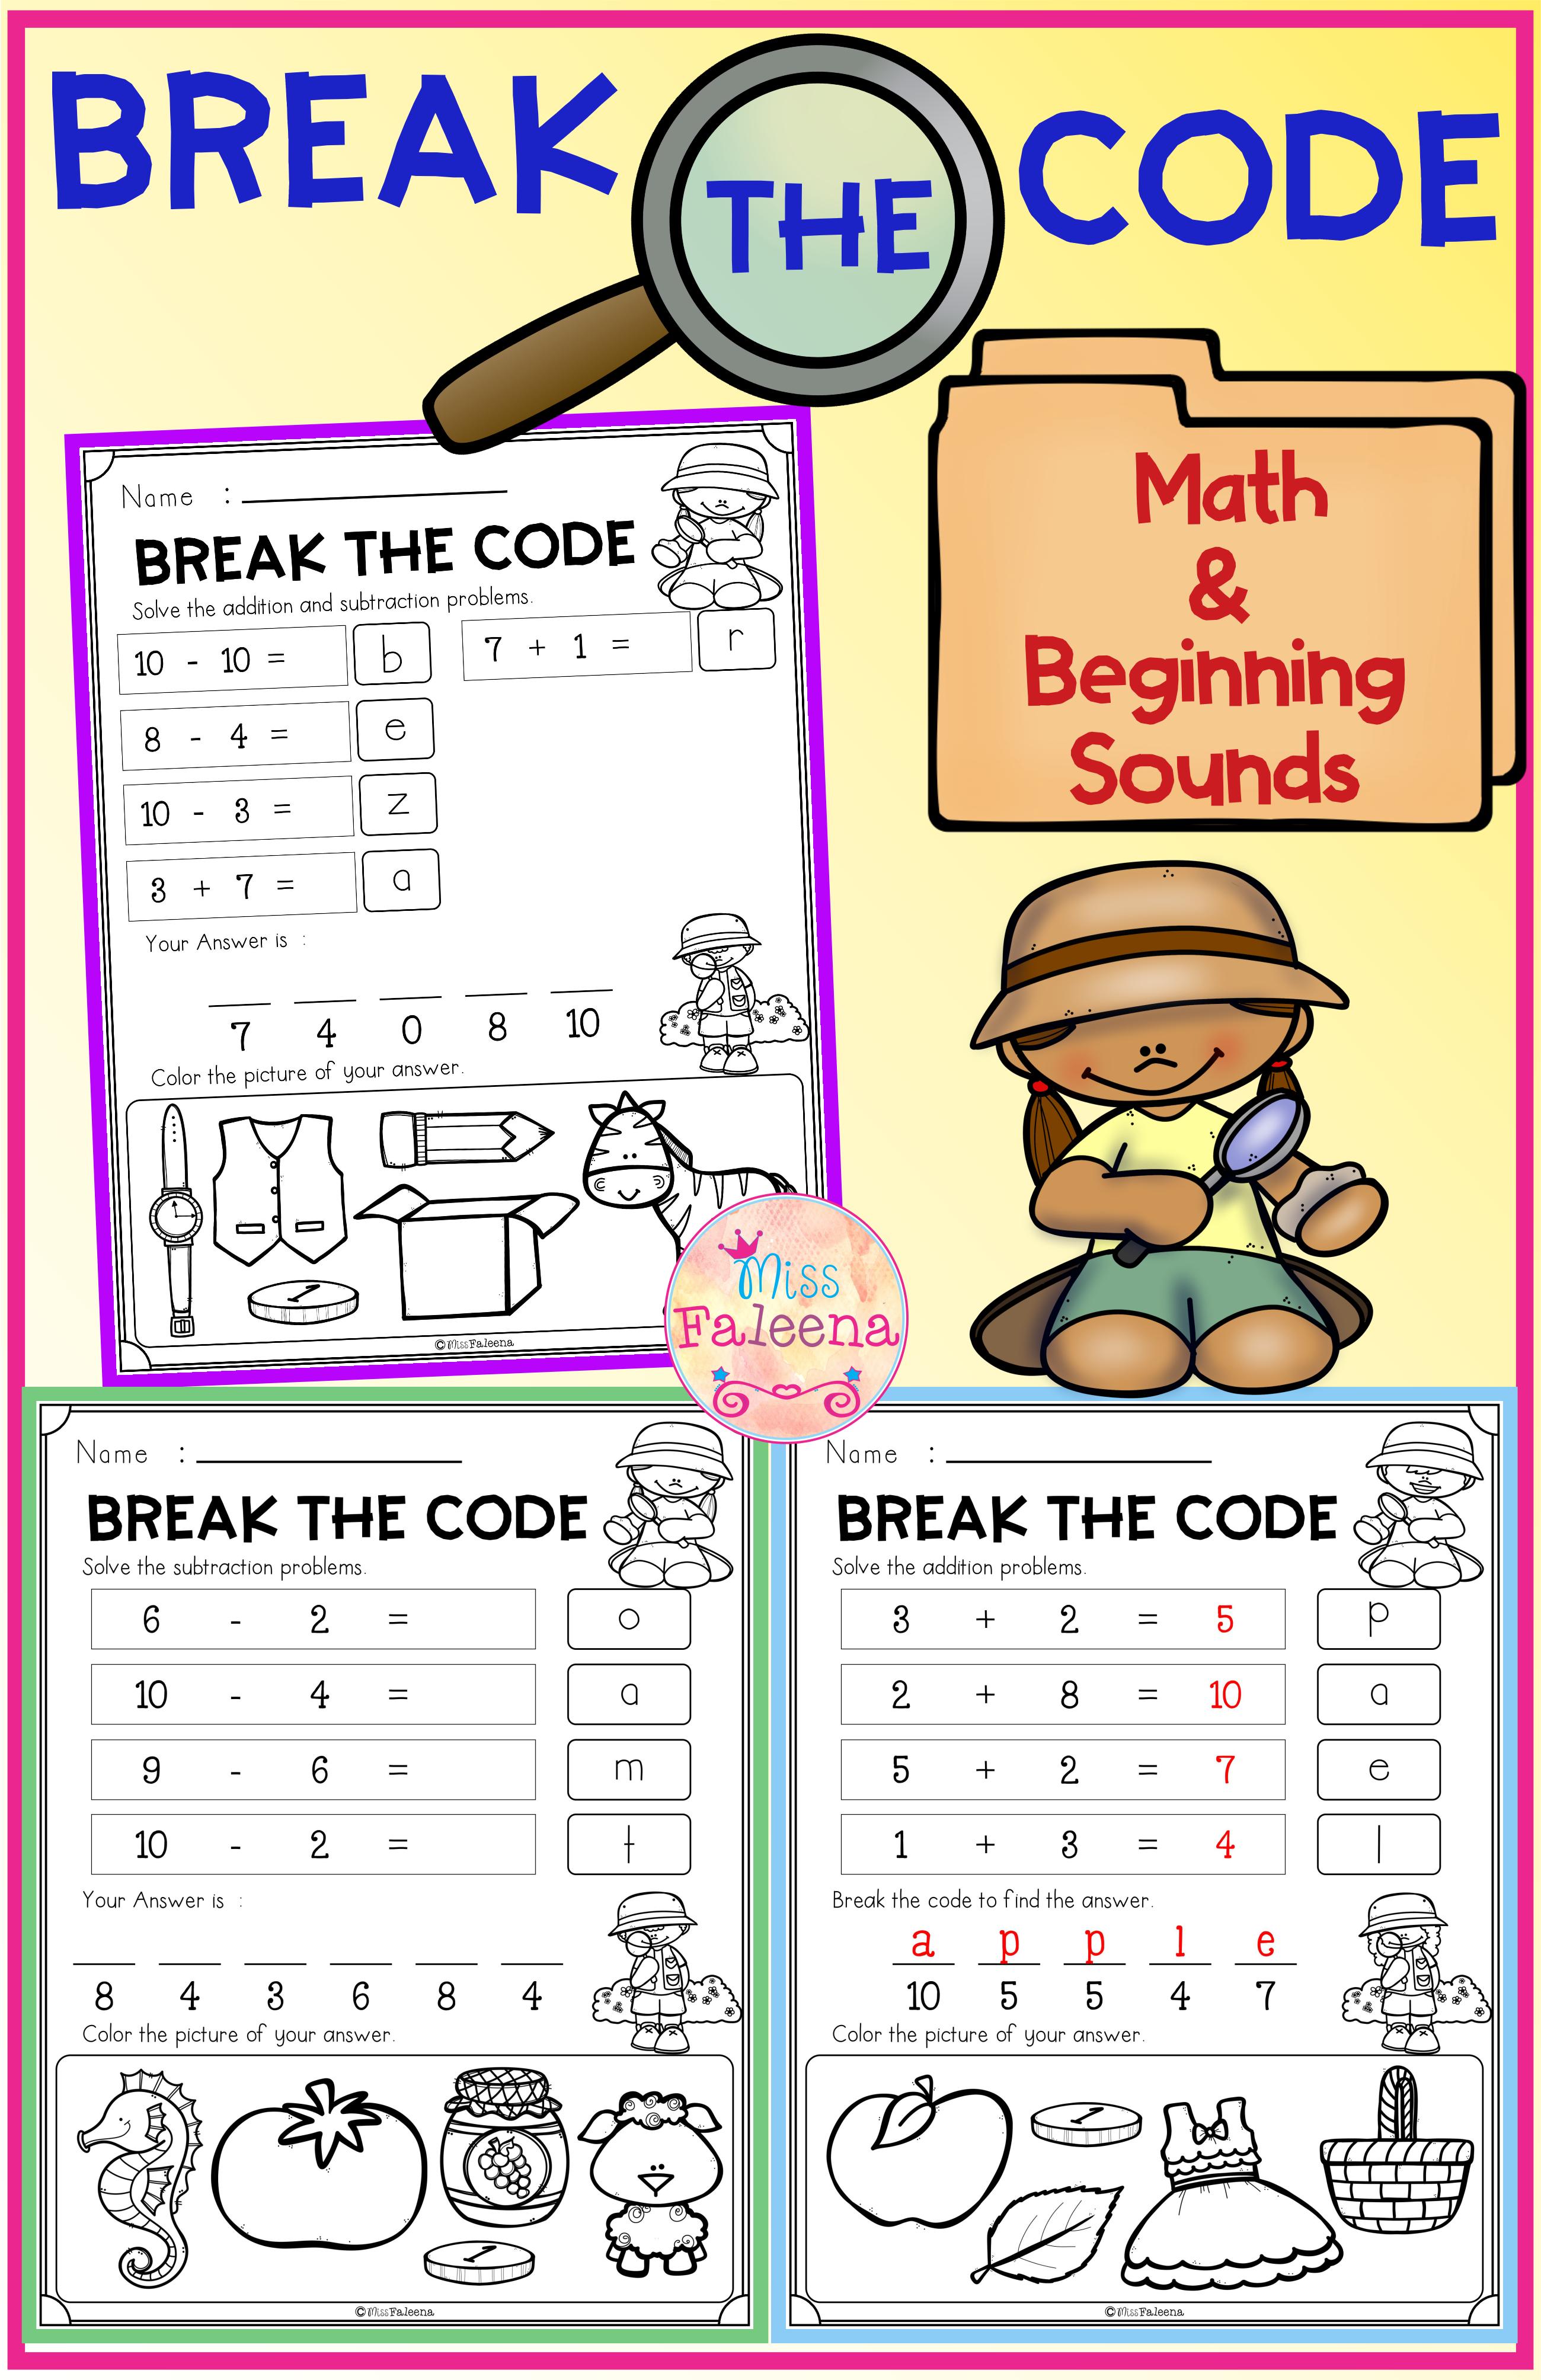 Break The Code Math And Beginning Sounds